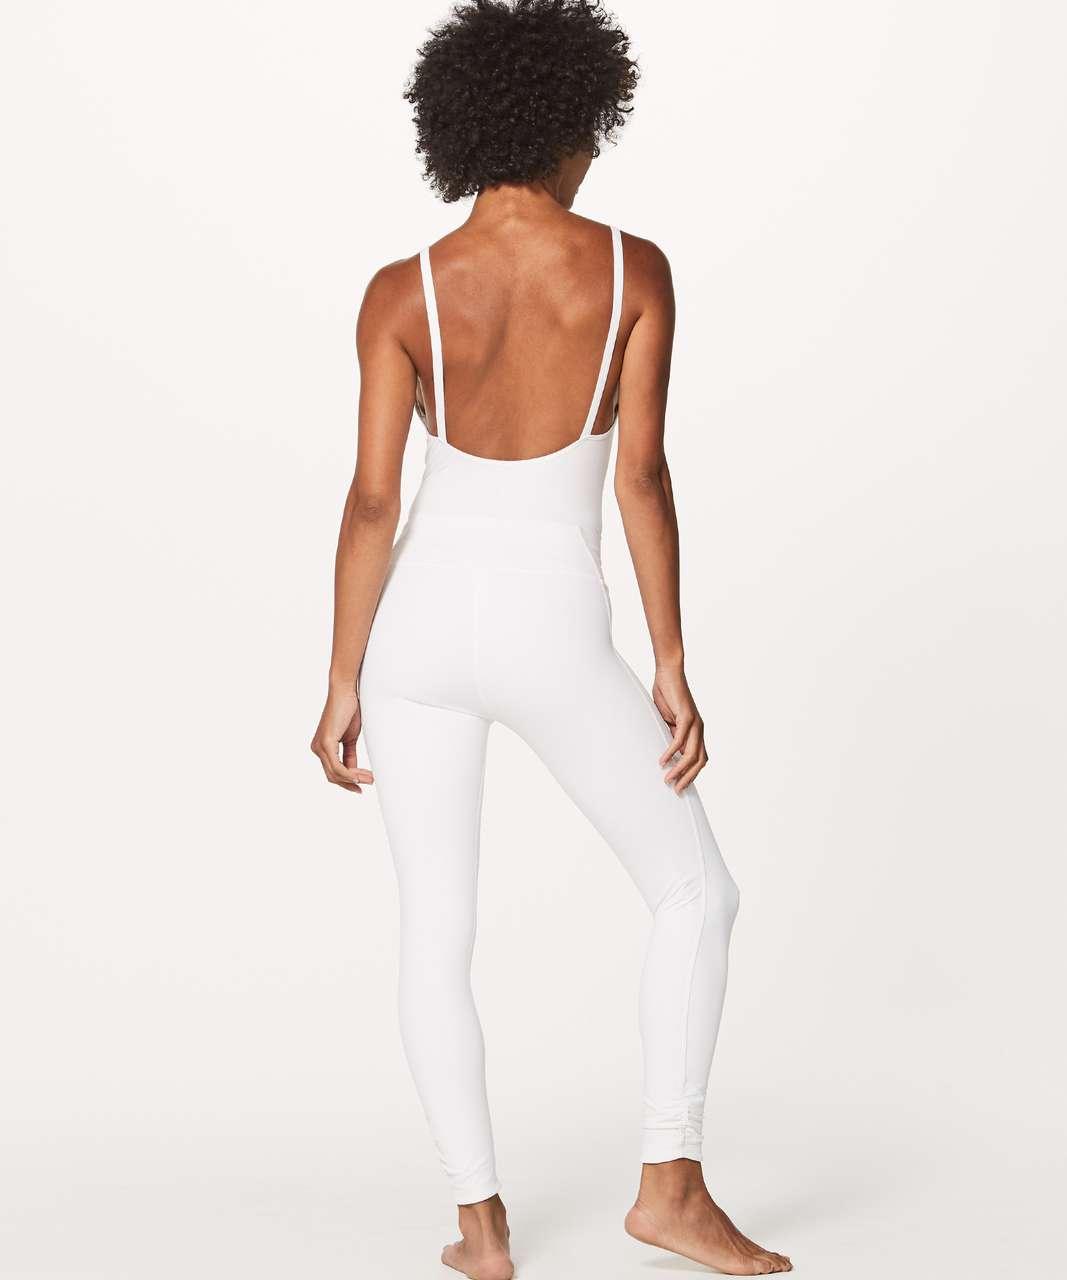 Lululemon Heart Opener Bodysuit (Taryn Toomey Collection) - White